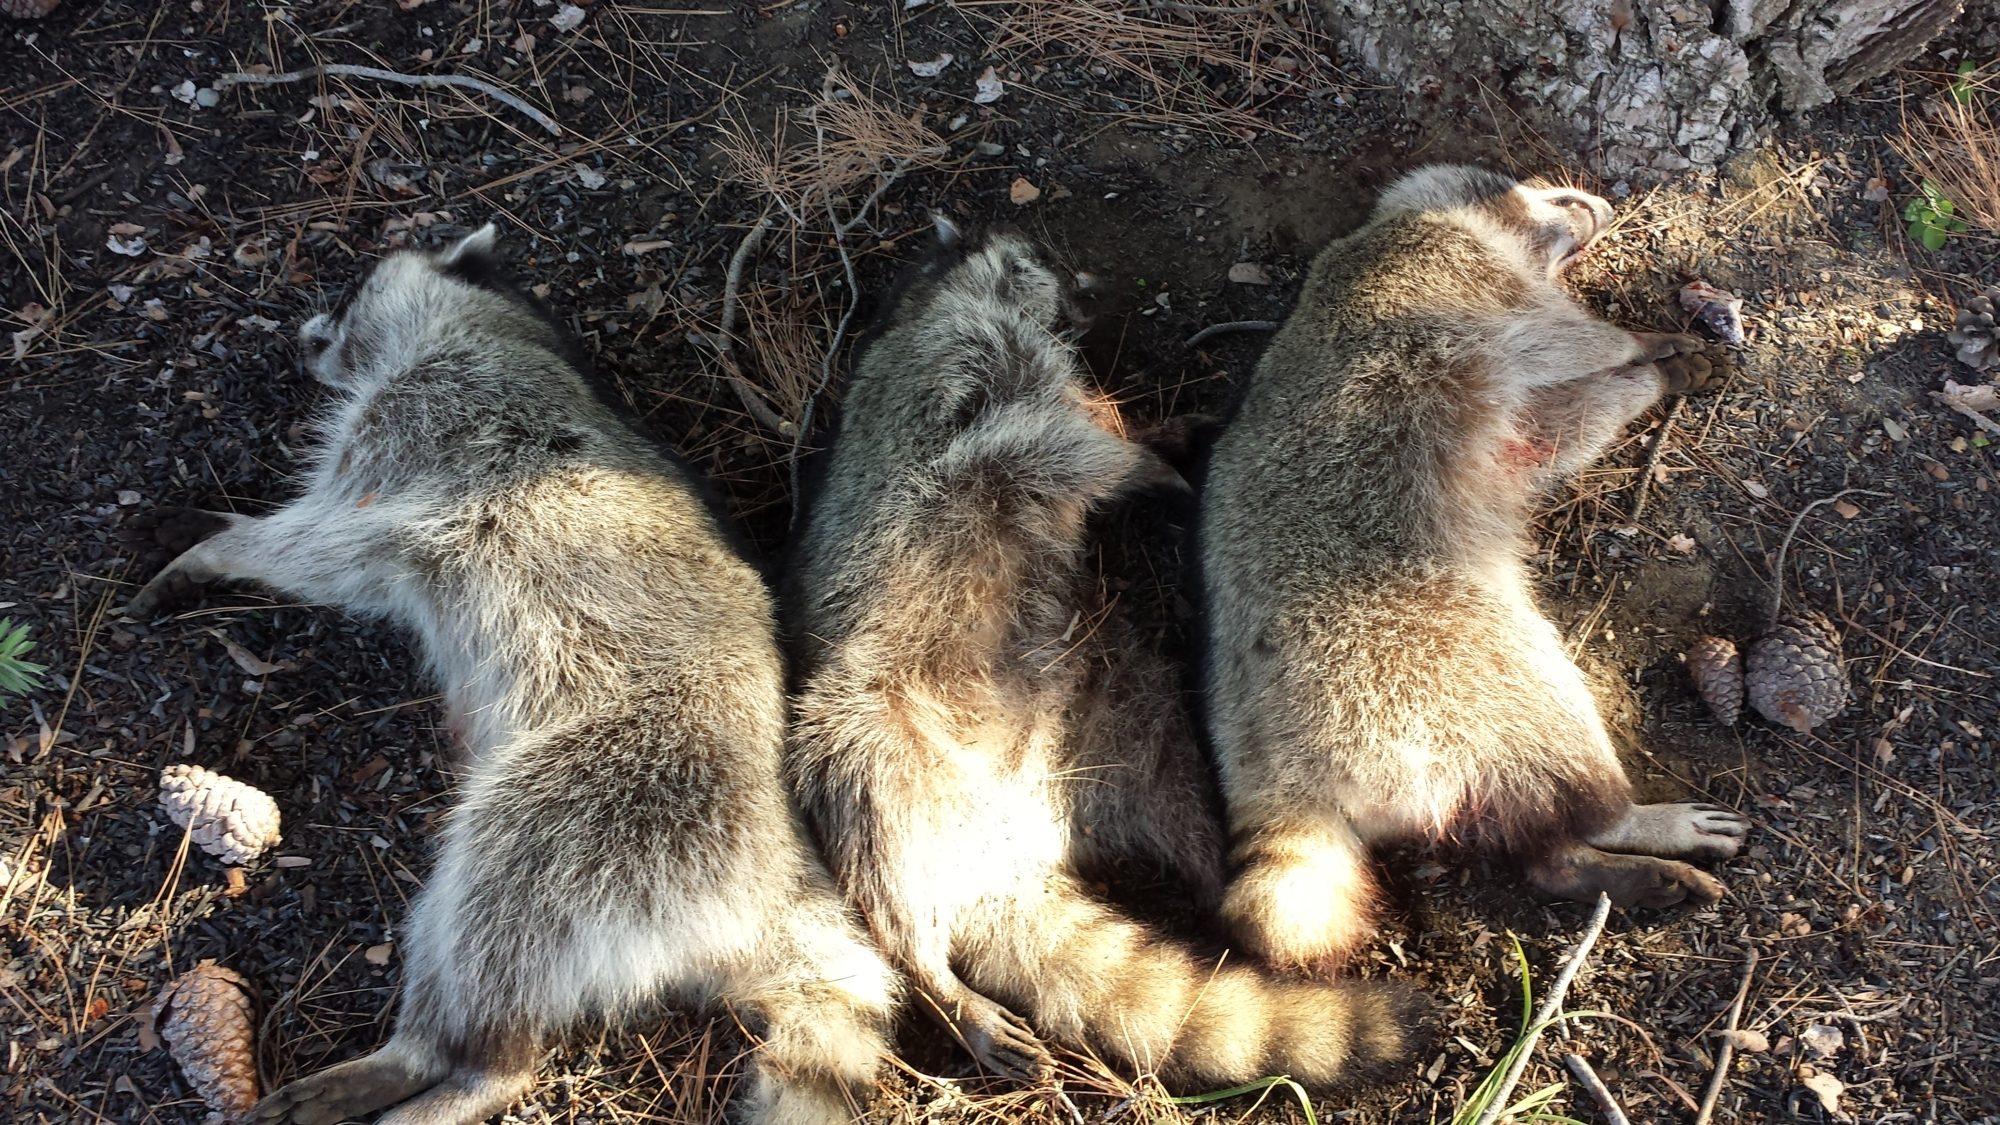 raccoon attack last night backyard chickens